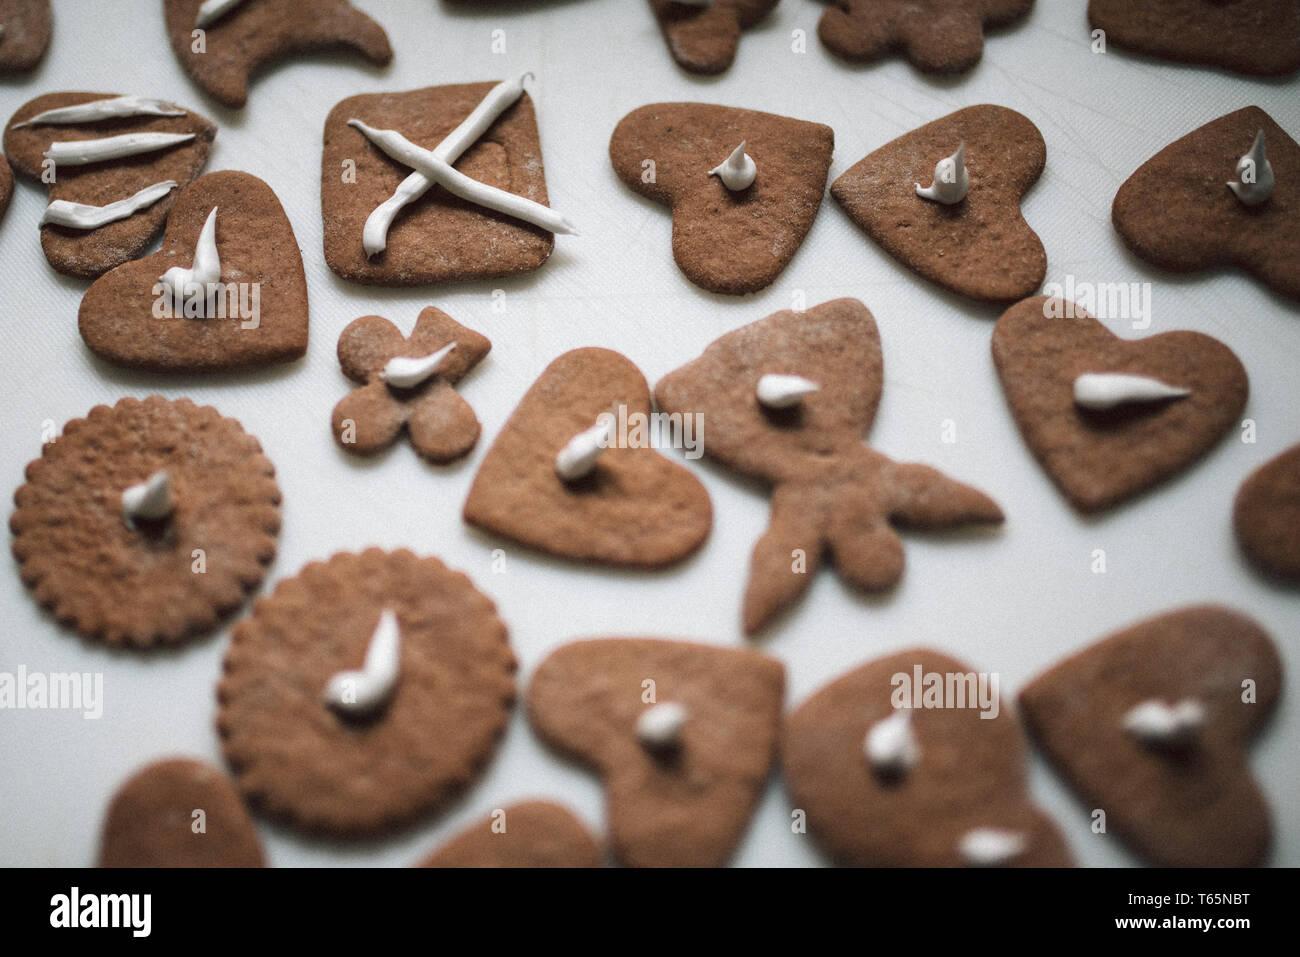 Weihnachtsgebäck Engelsaugen.Plätzchen Kinder Stock Photos Plätzchen Kinder Stock Images Alamy